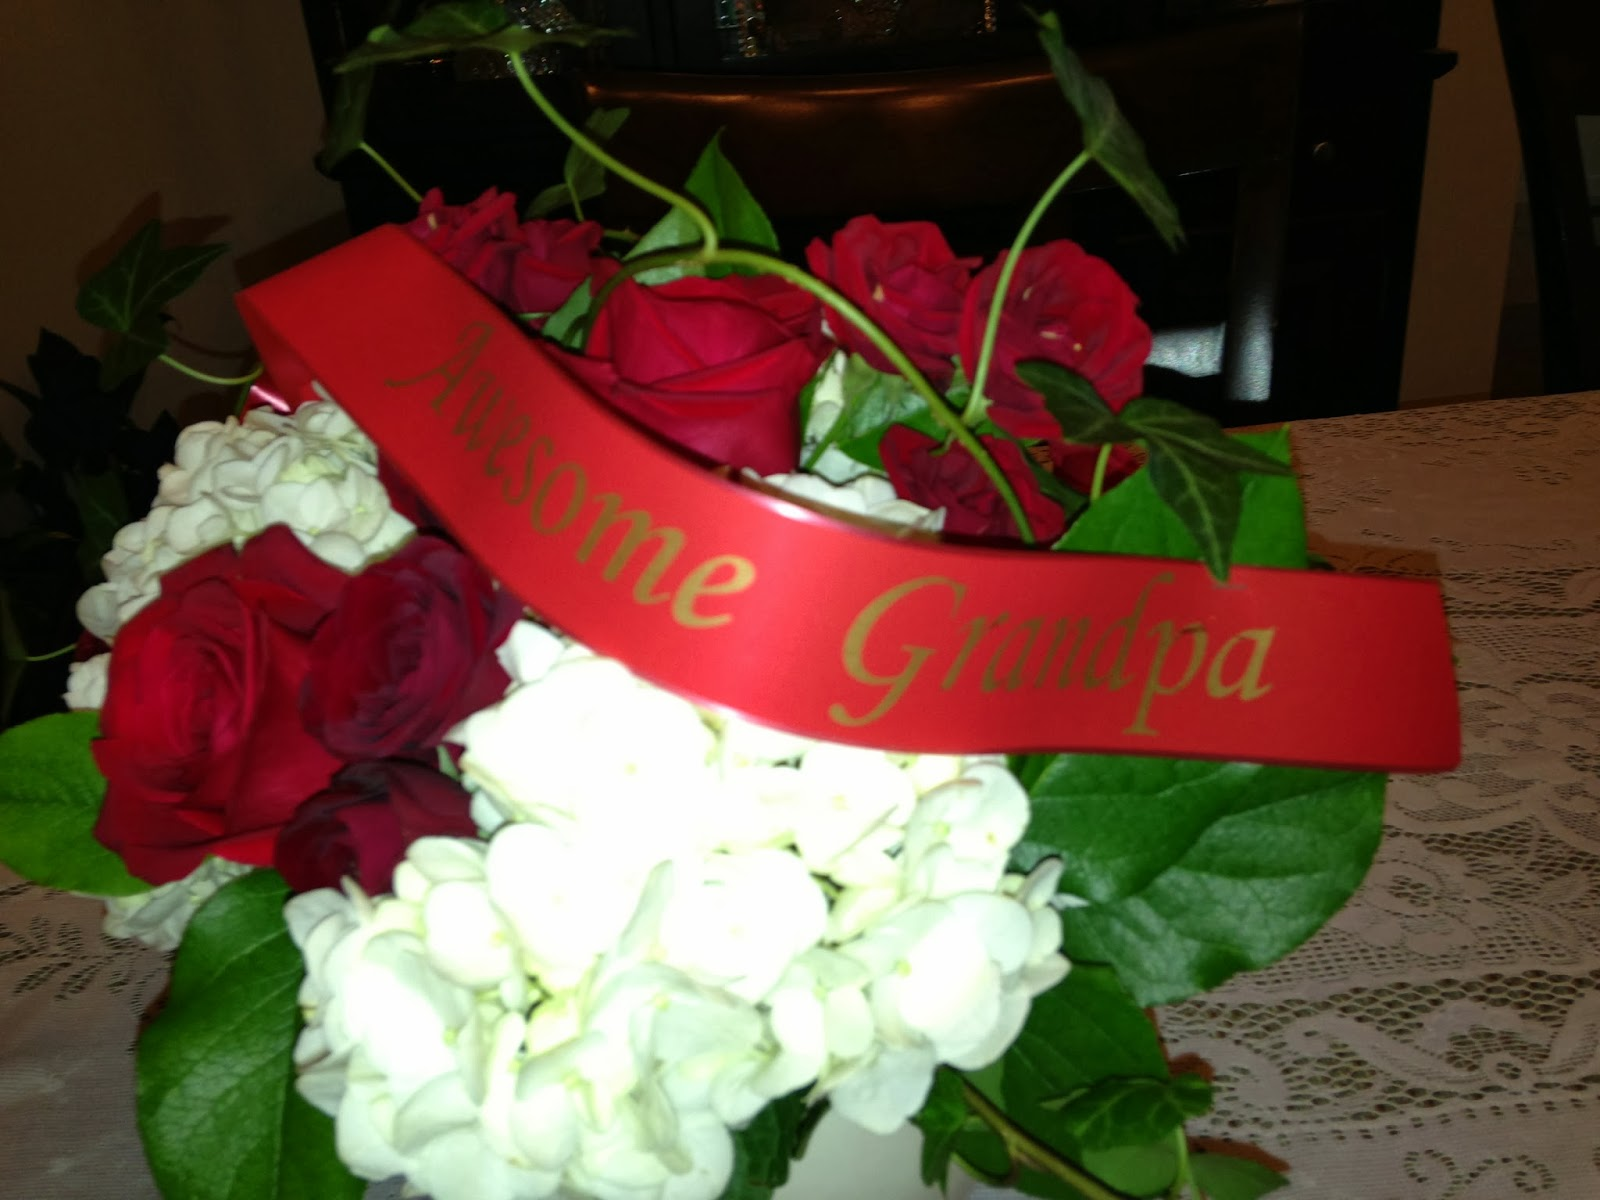 Funeral flower card sayings poemview sayings for funeral flowers choice image flower wallpaper hd izmirmasajfo